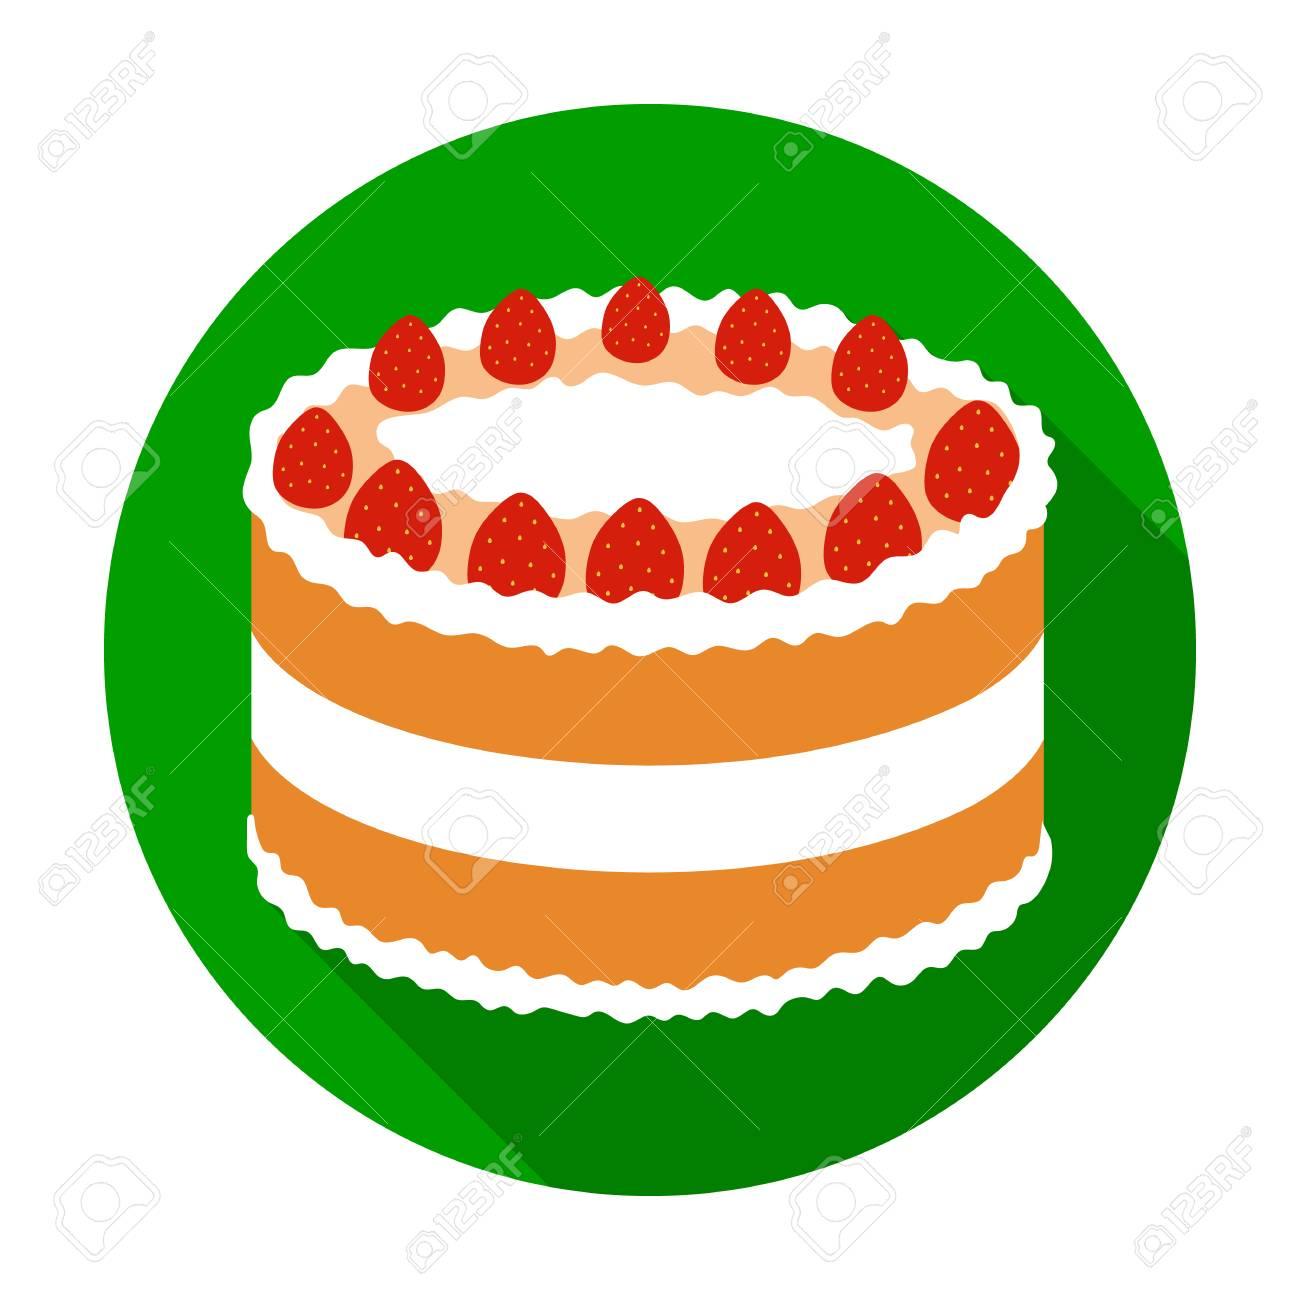 Strawberry Cake Icon In Flat Style Isolated On White Background